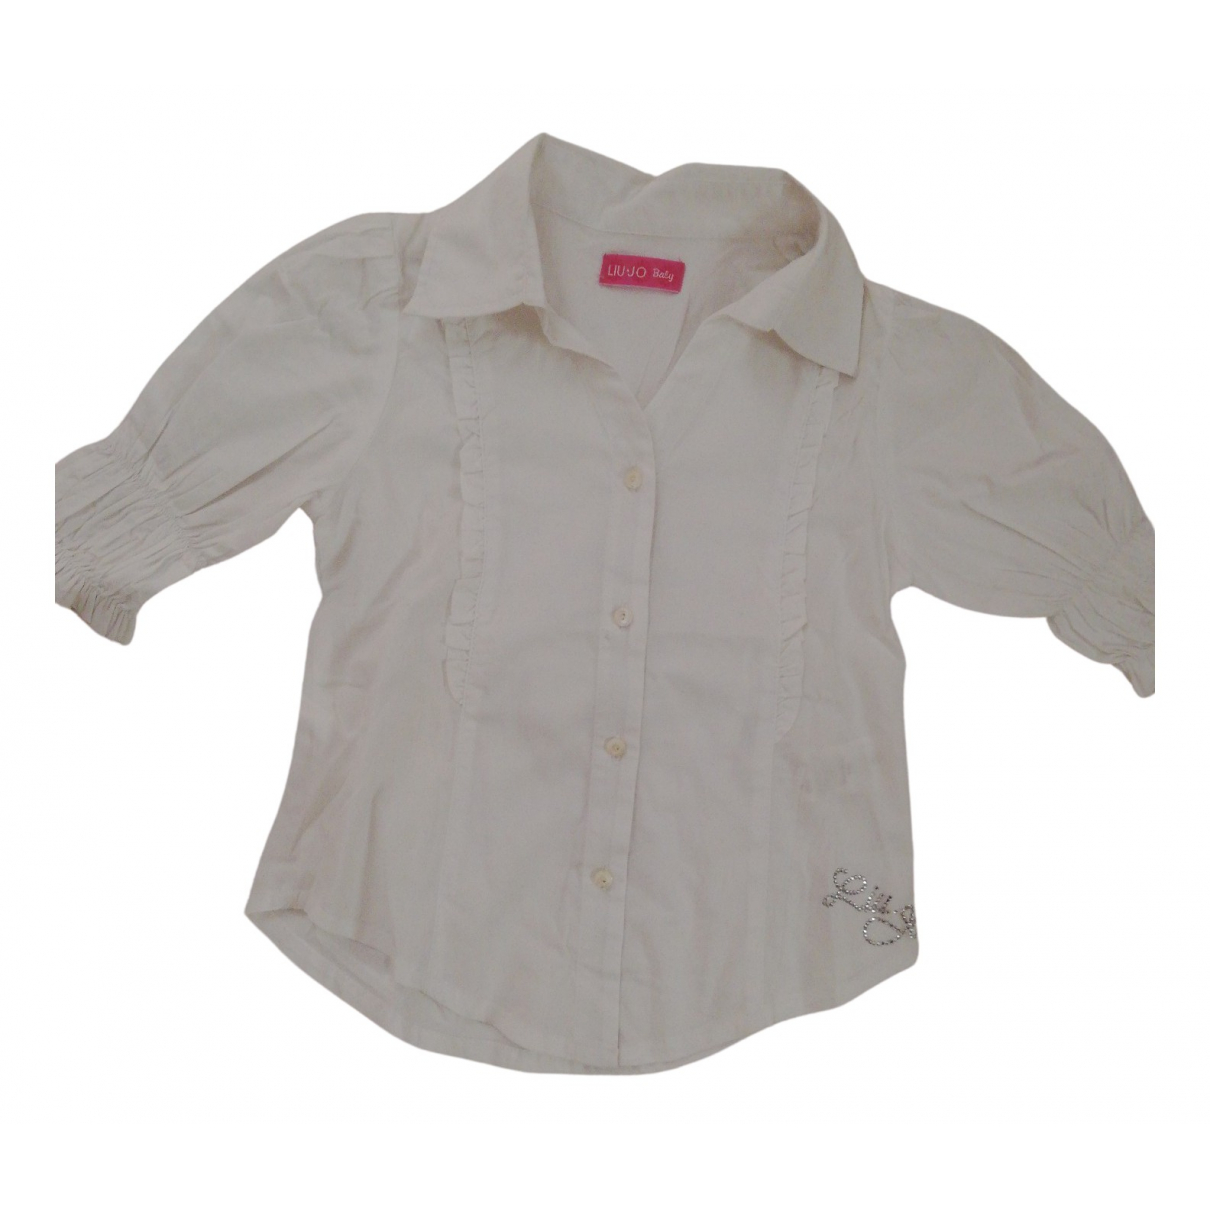 Liu.jo - Top   pour enfant en coton - blanc